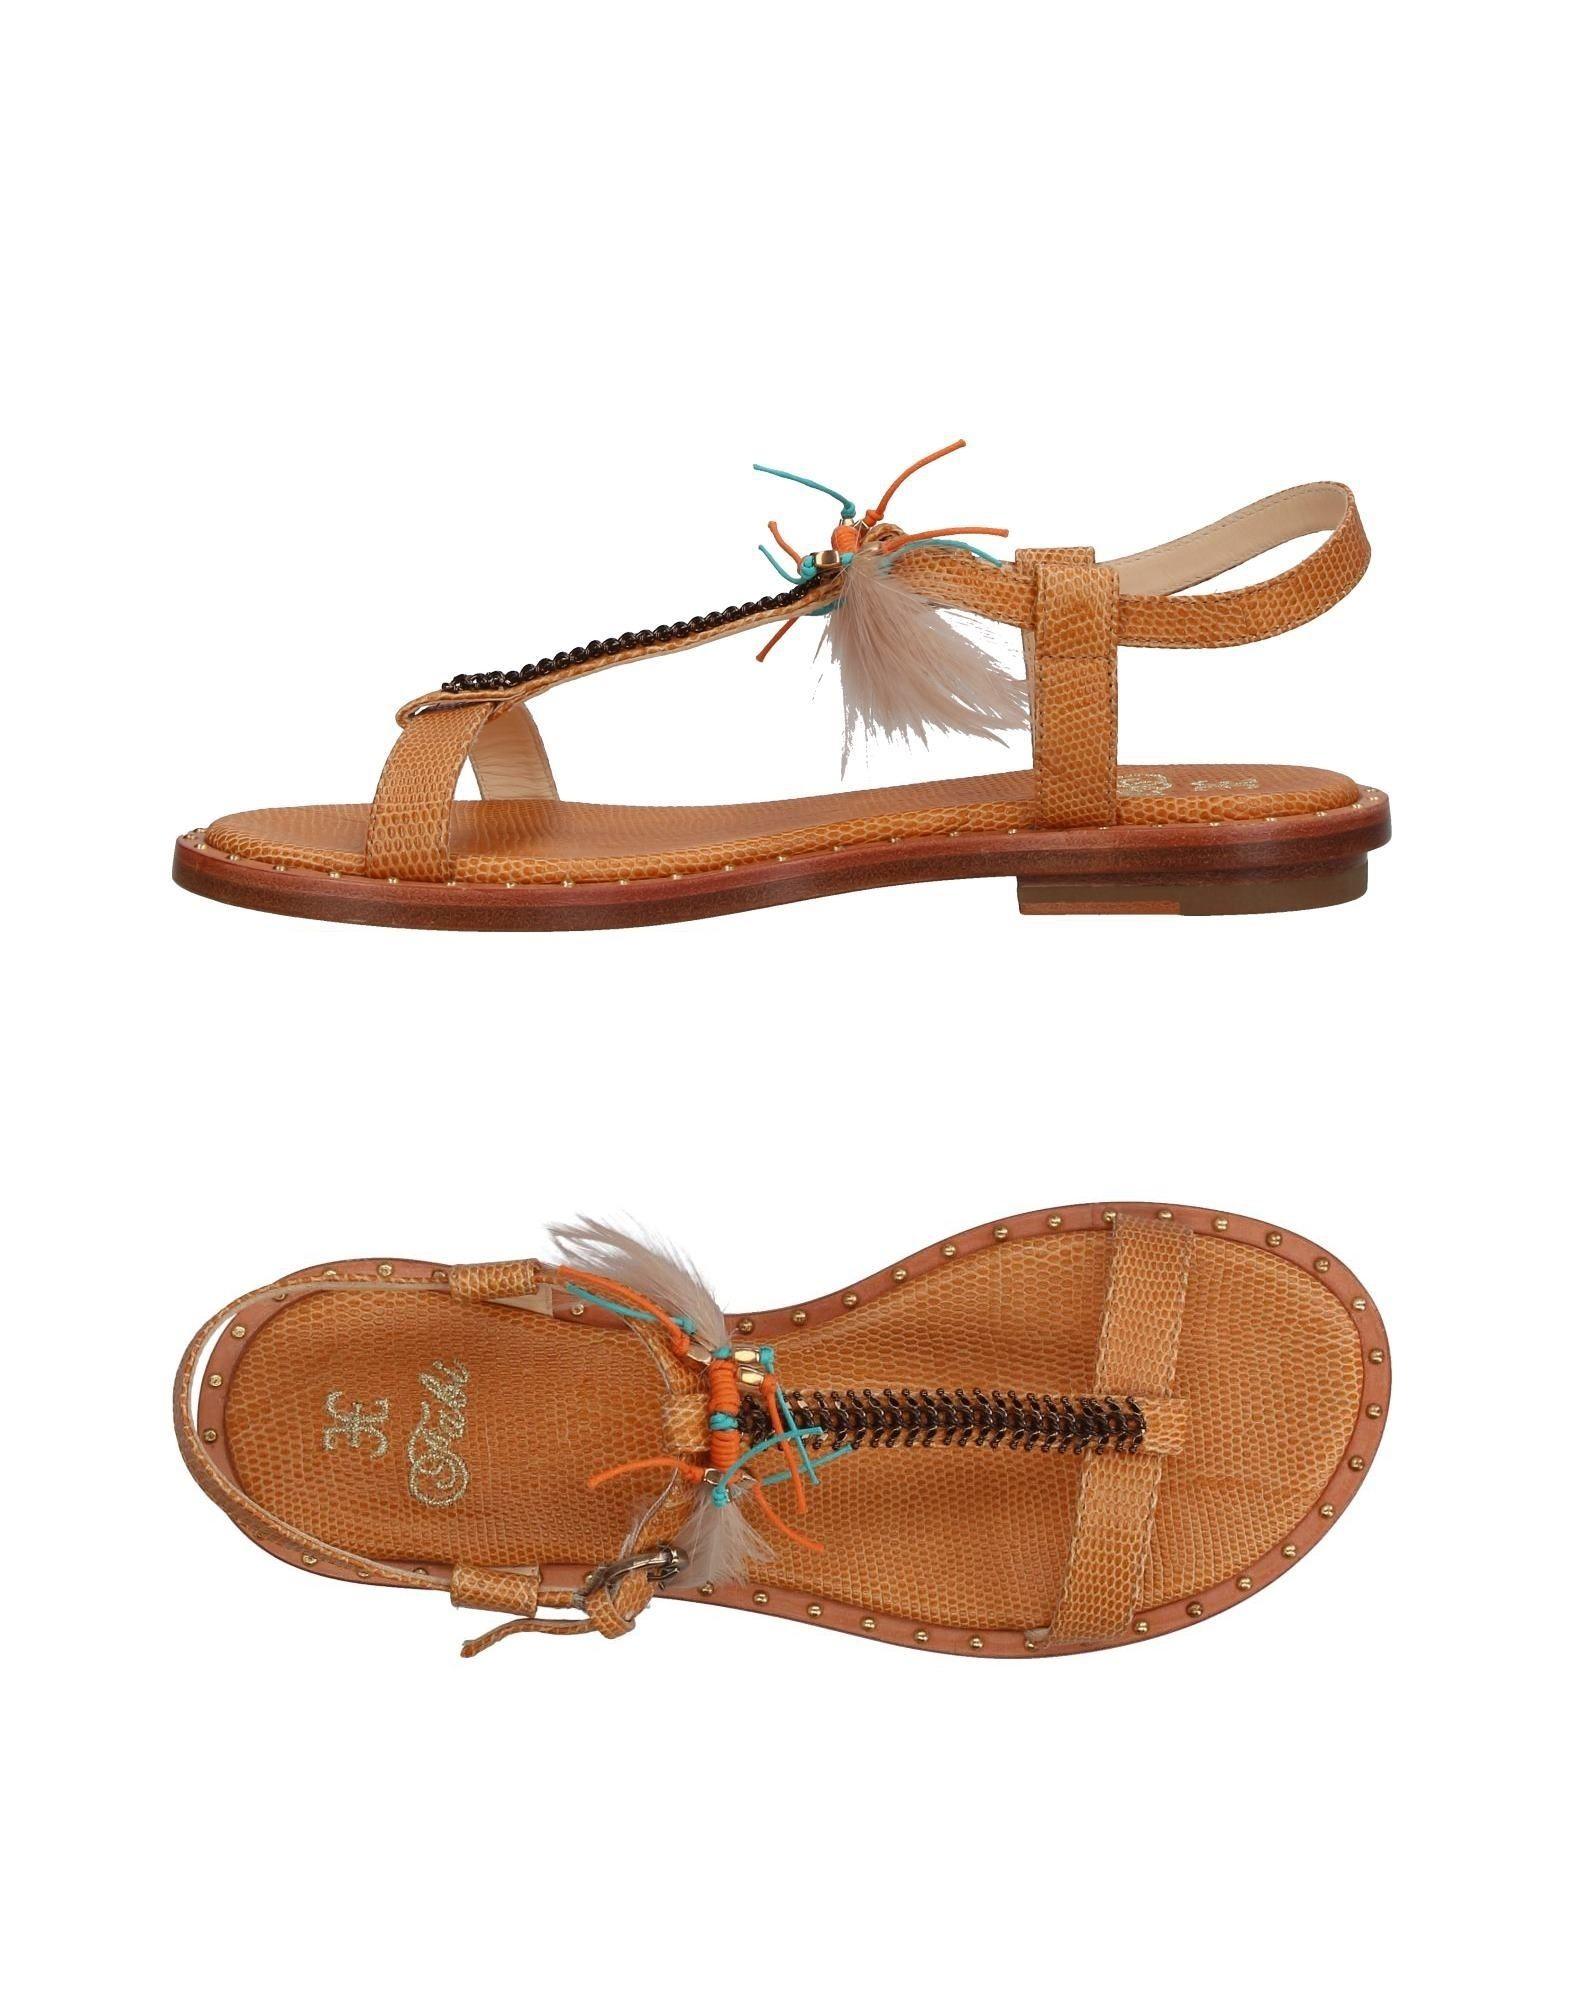 Sandales Fabi Femme - Sandales Fabi sur